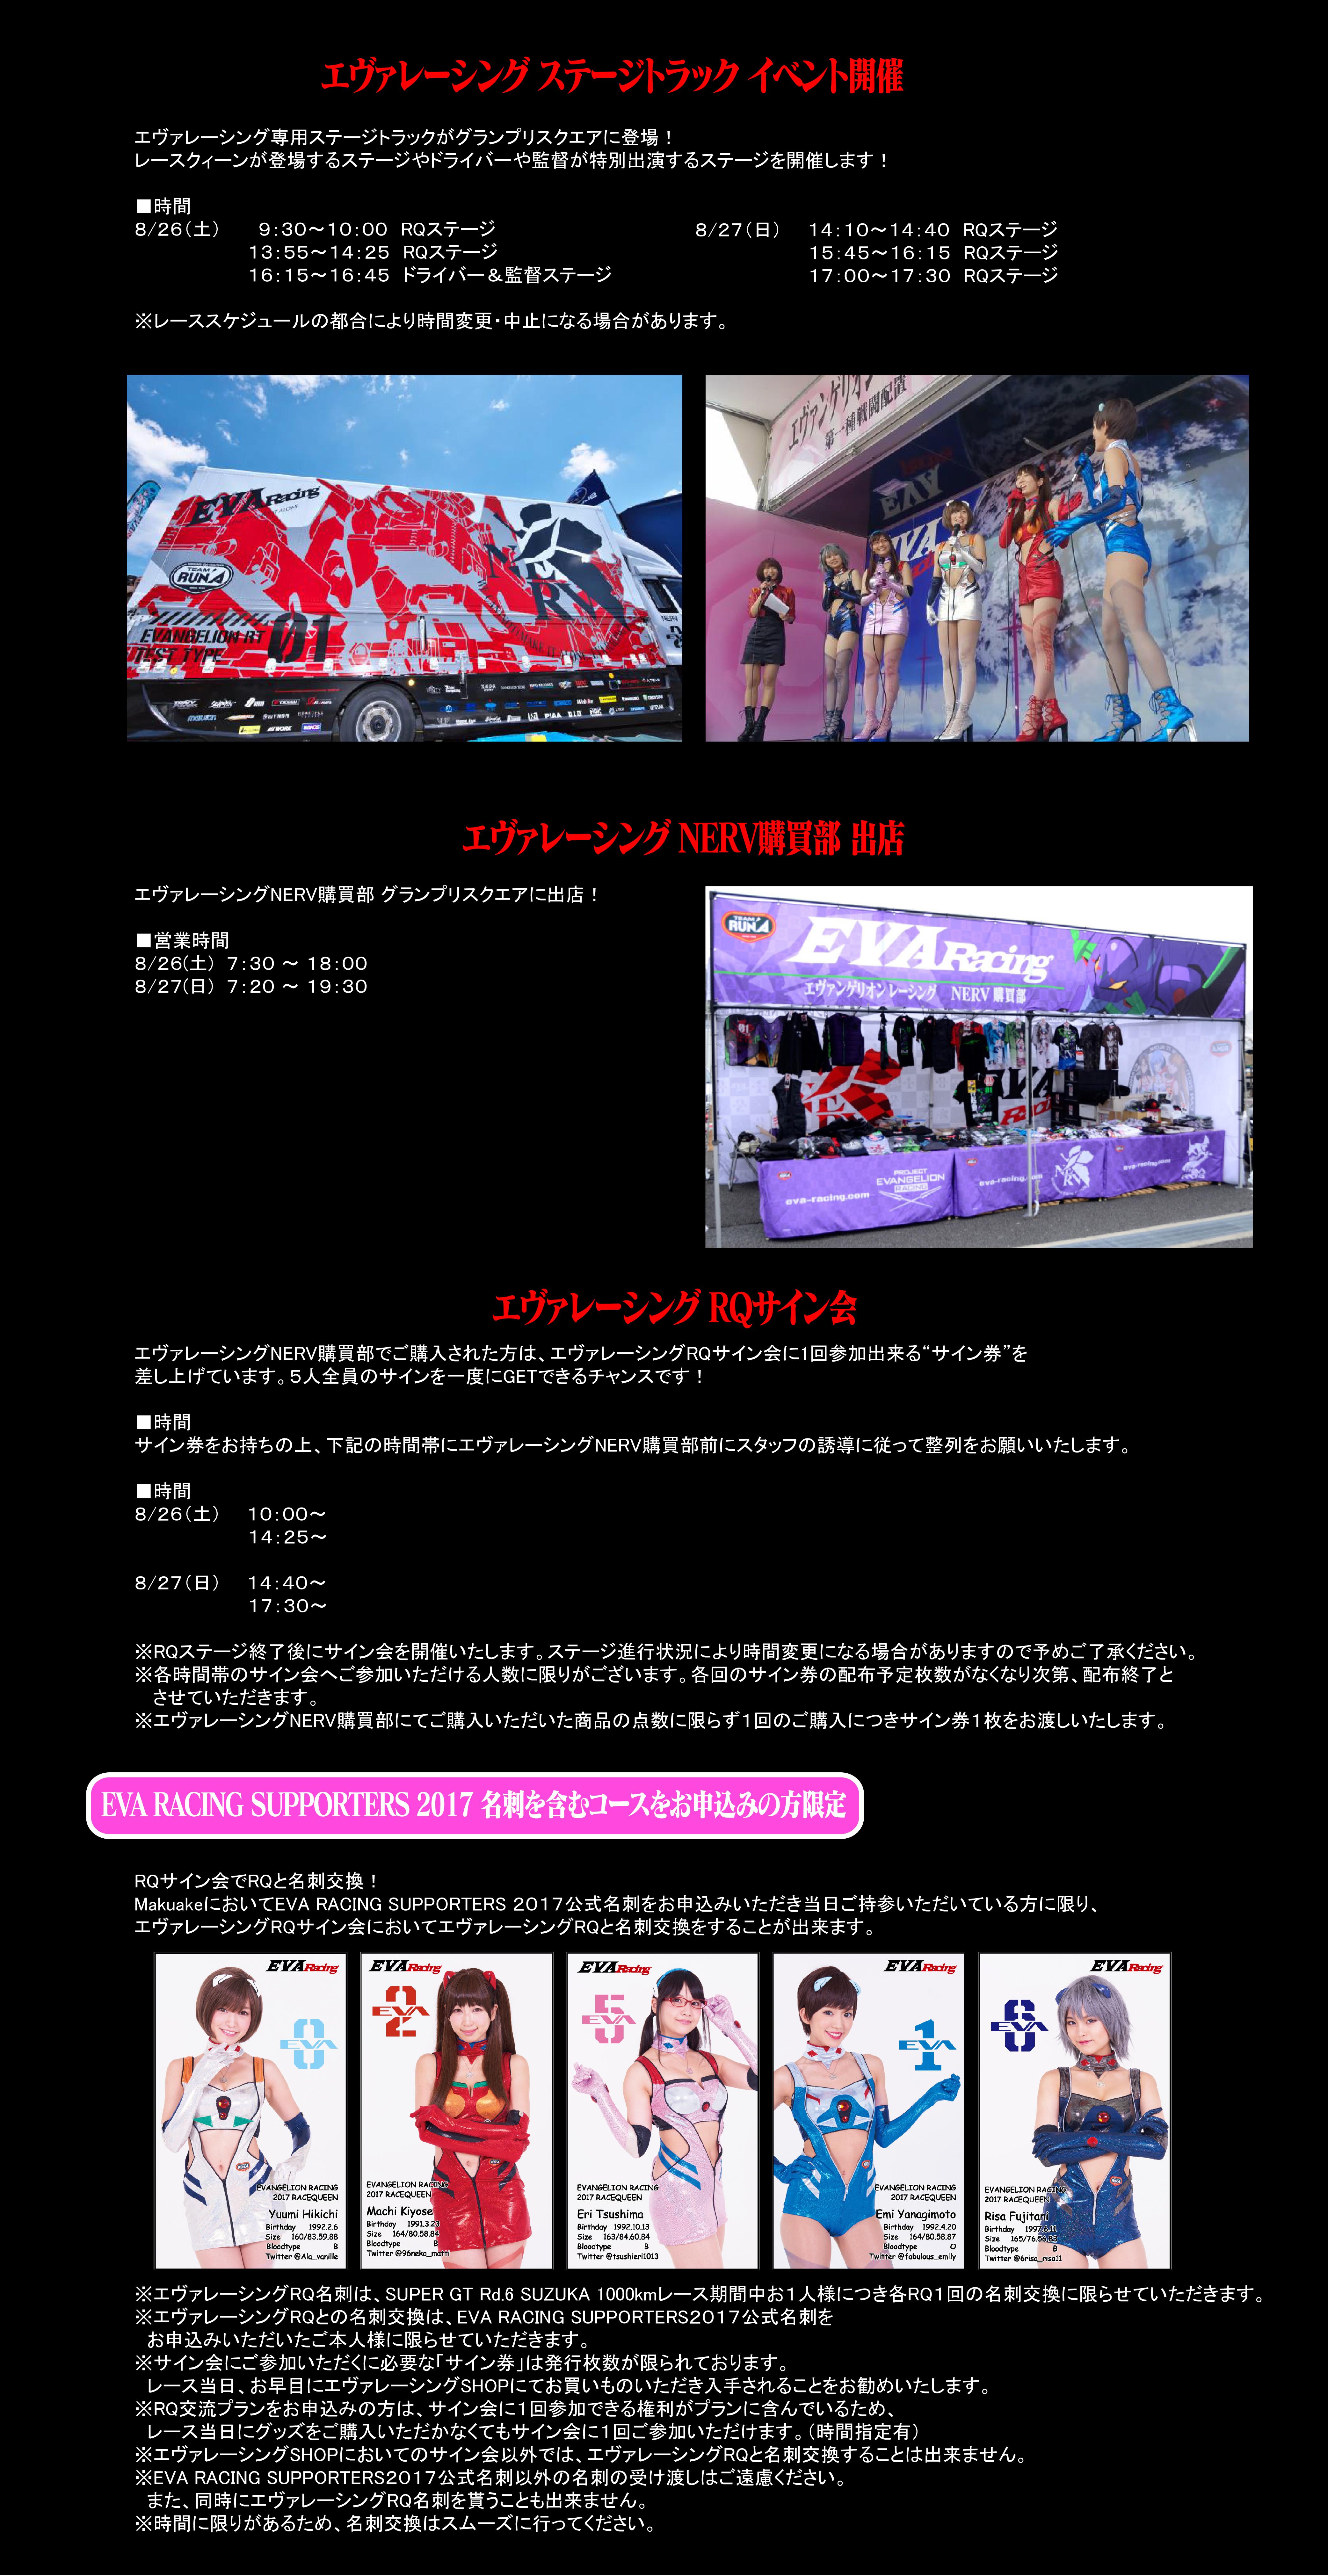 SGT SUZUKA イベント情報_2017 SGTsuzuka